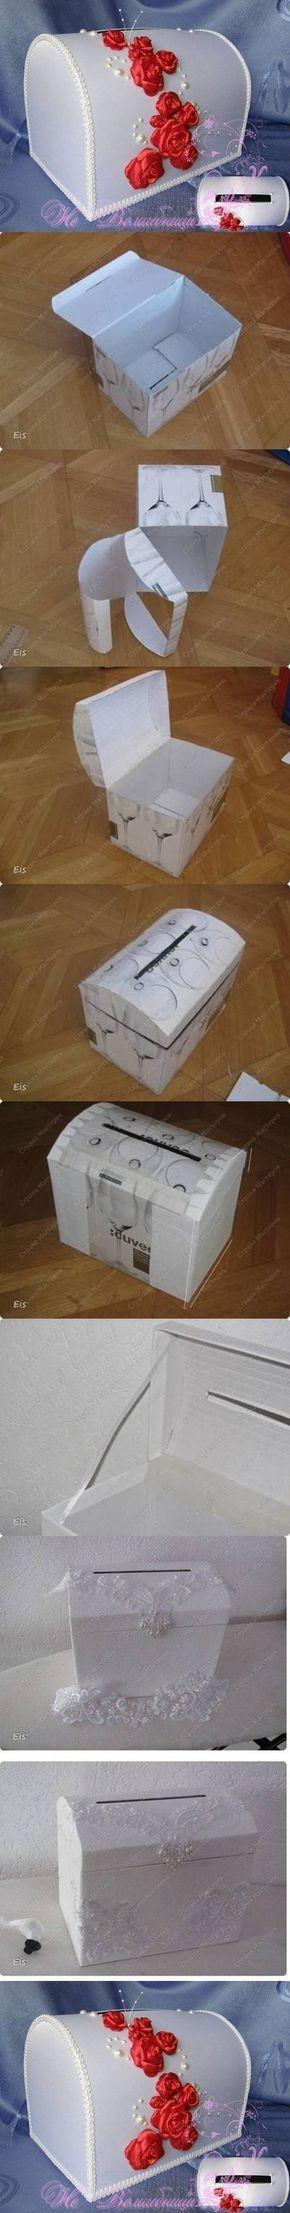 DIY Cardboard Box Art DIY Projects / UsefulDIY.com